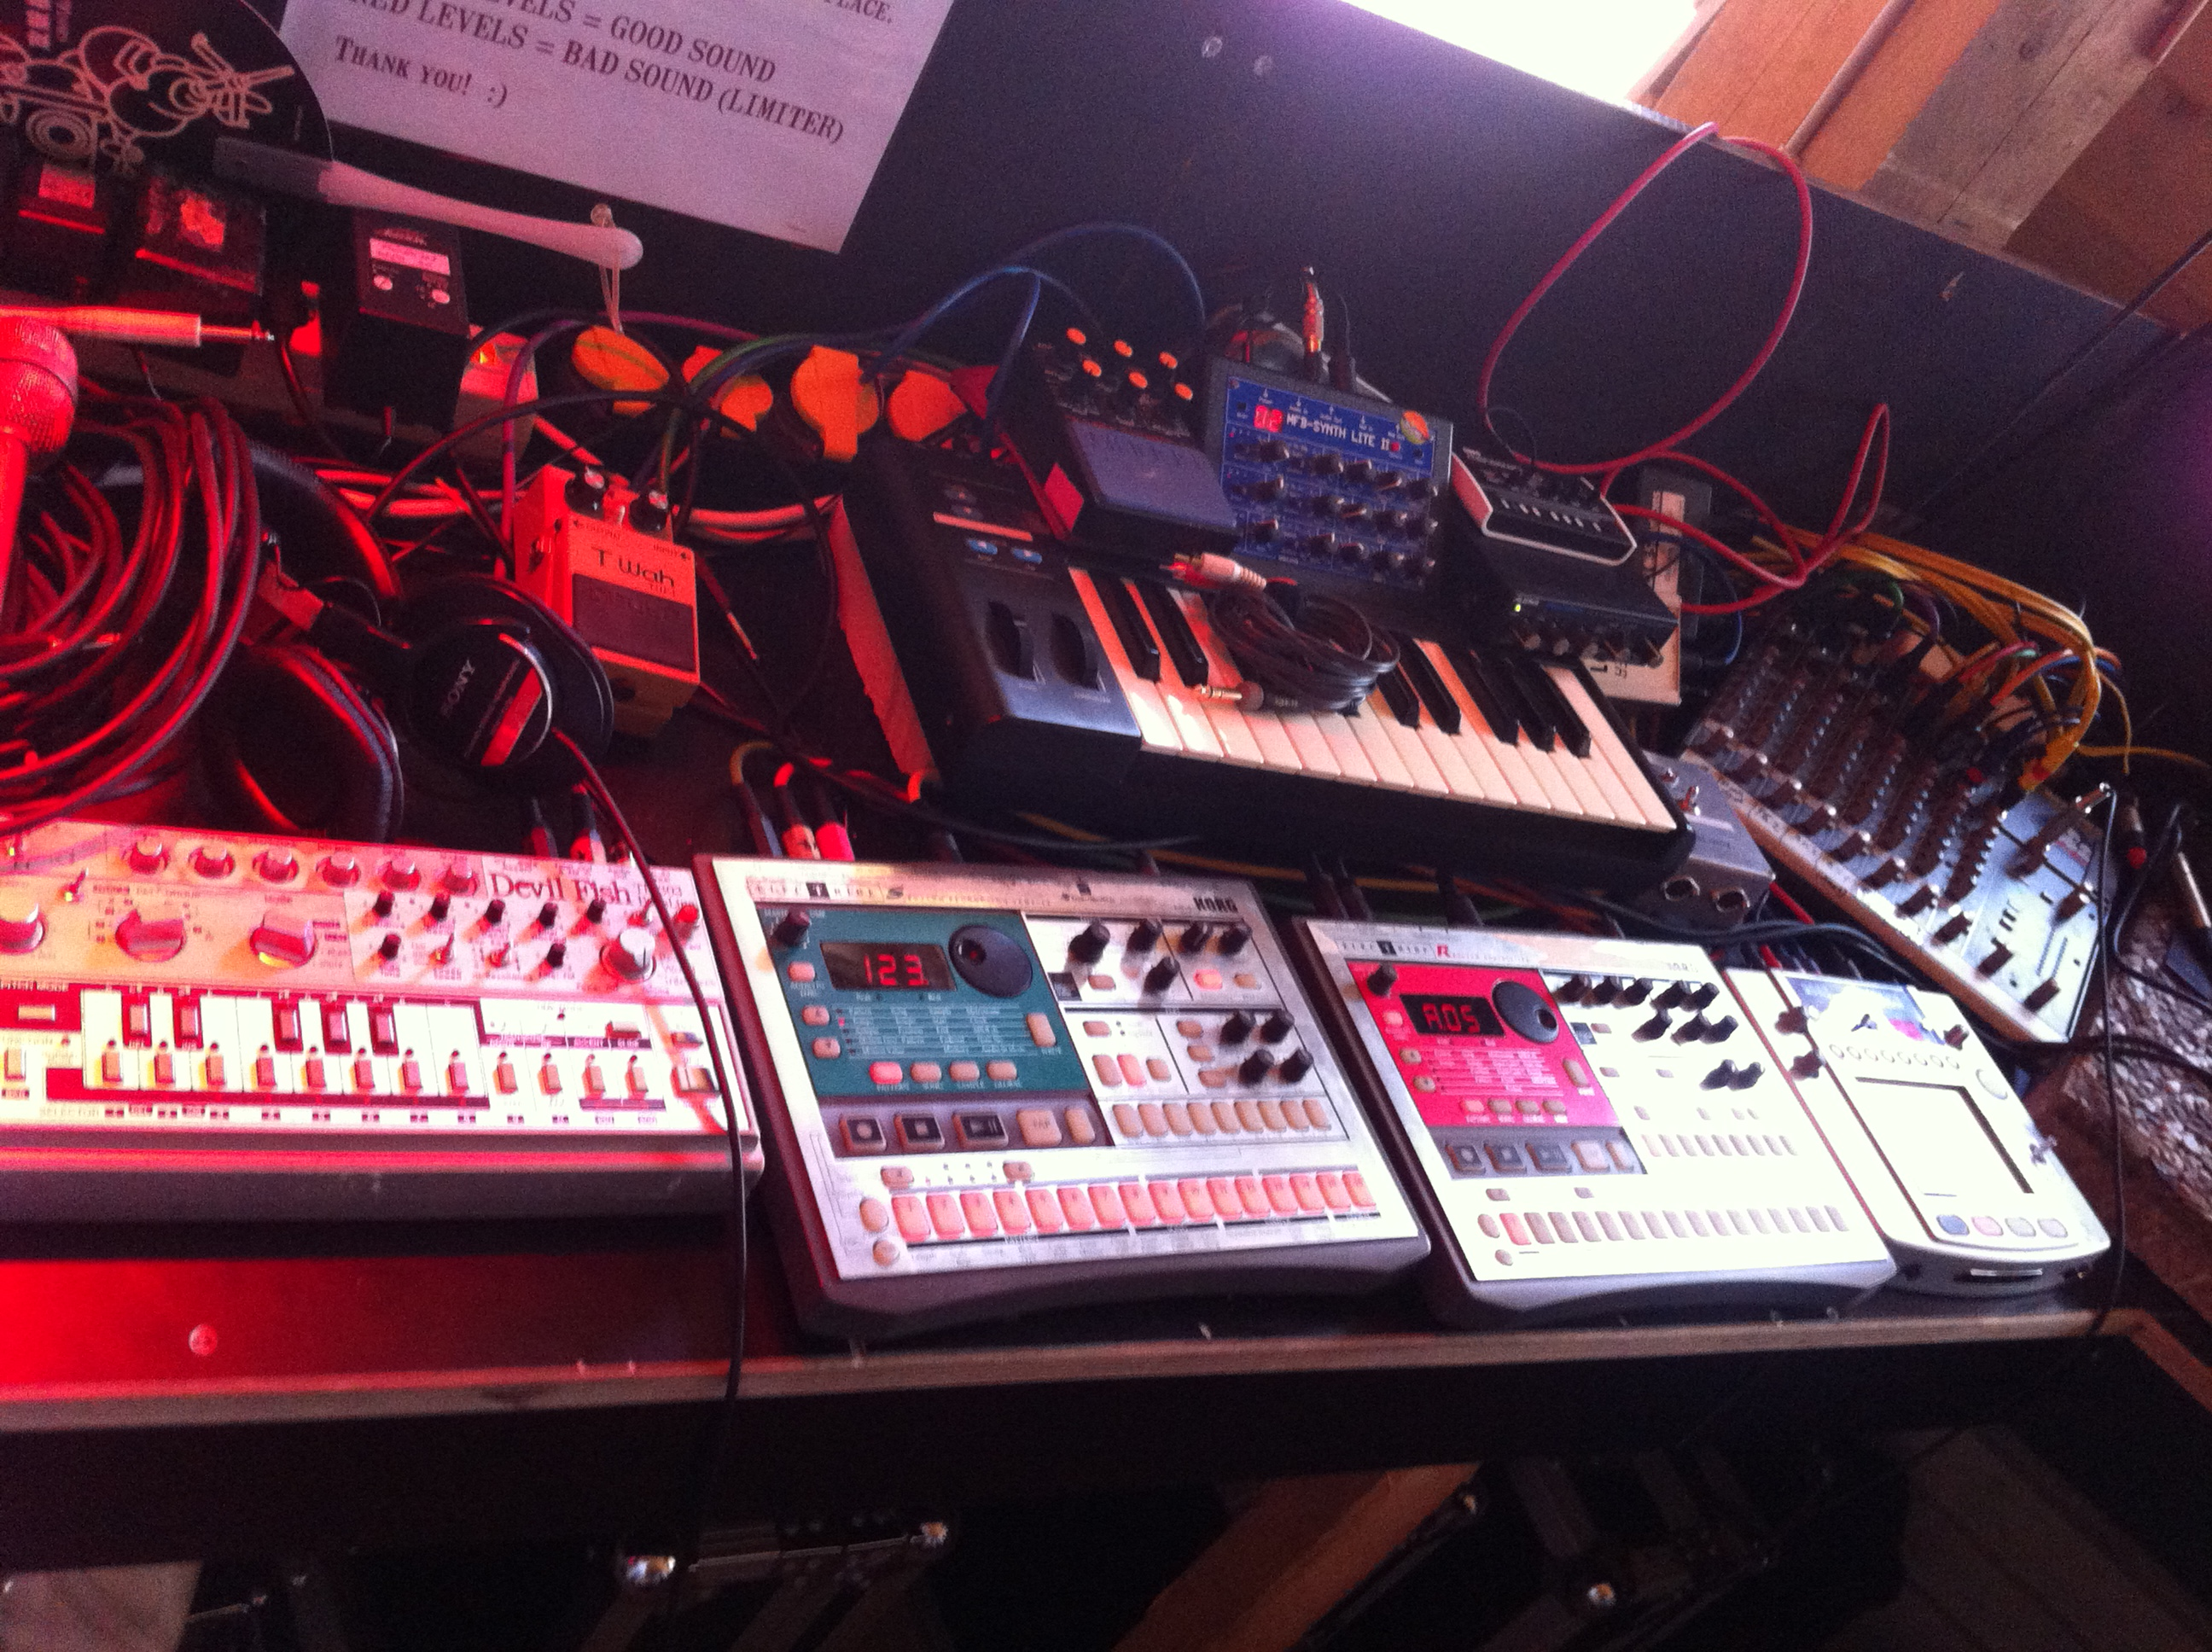 Mijk setup on stage